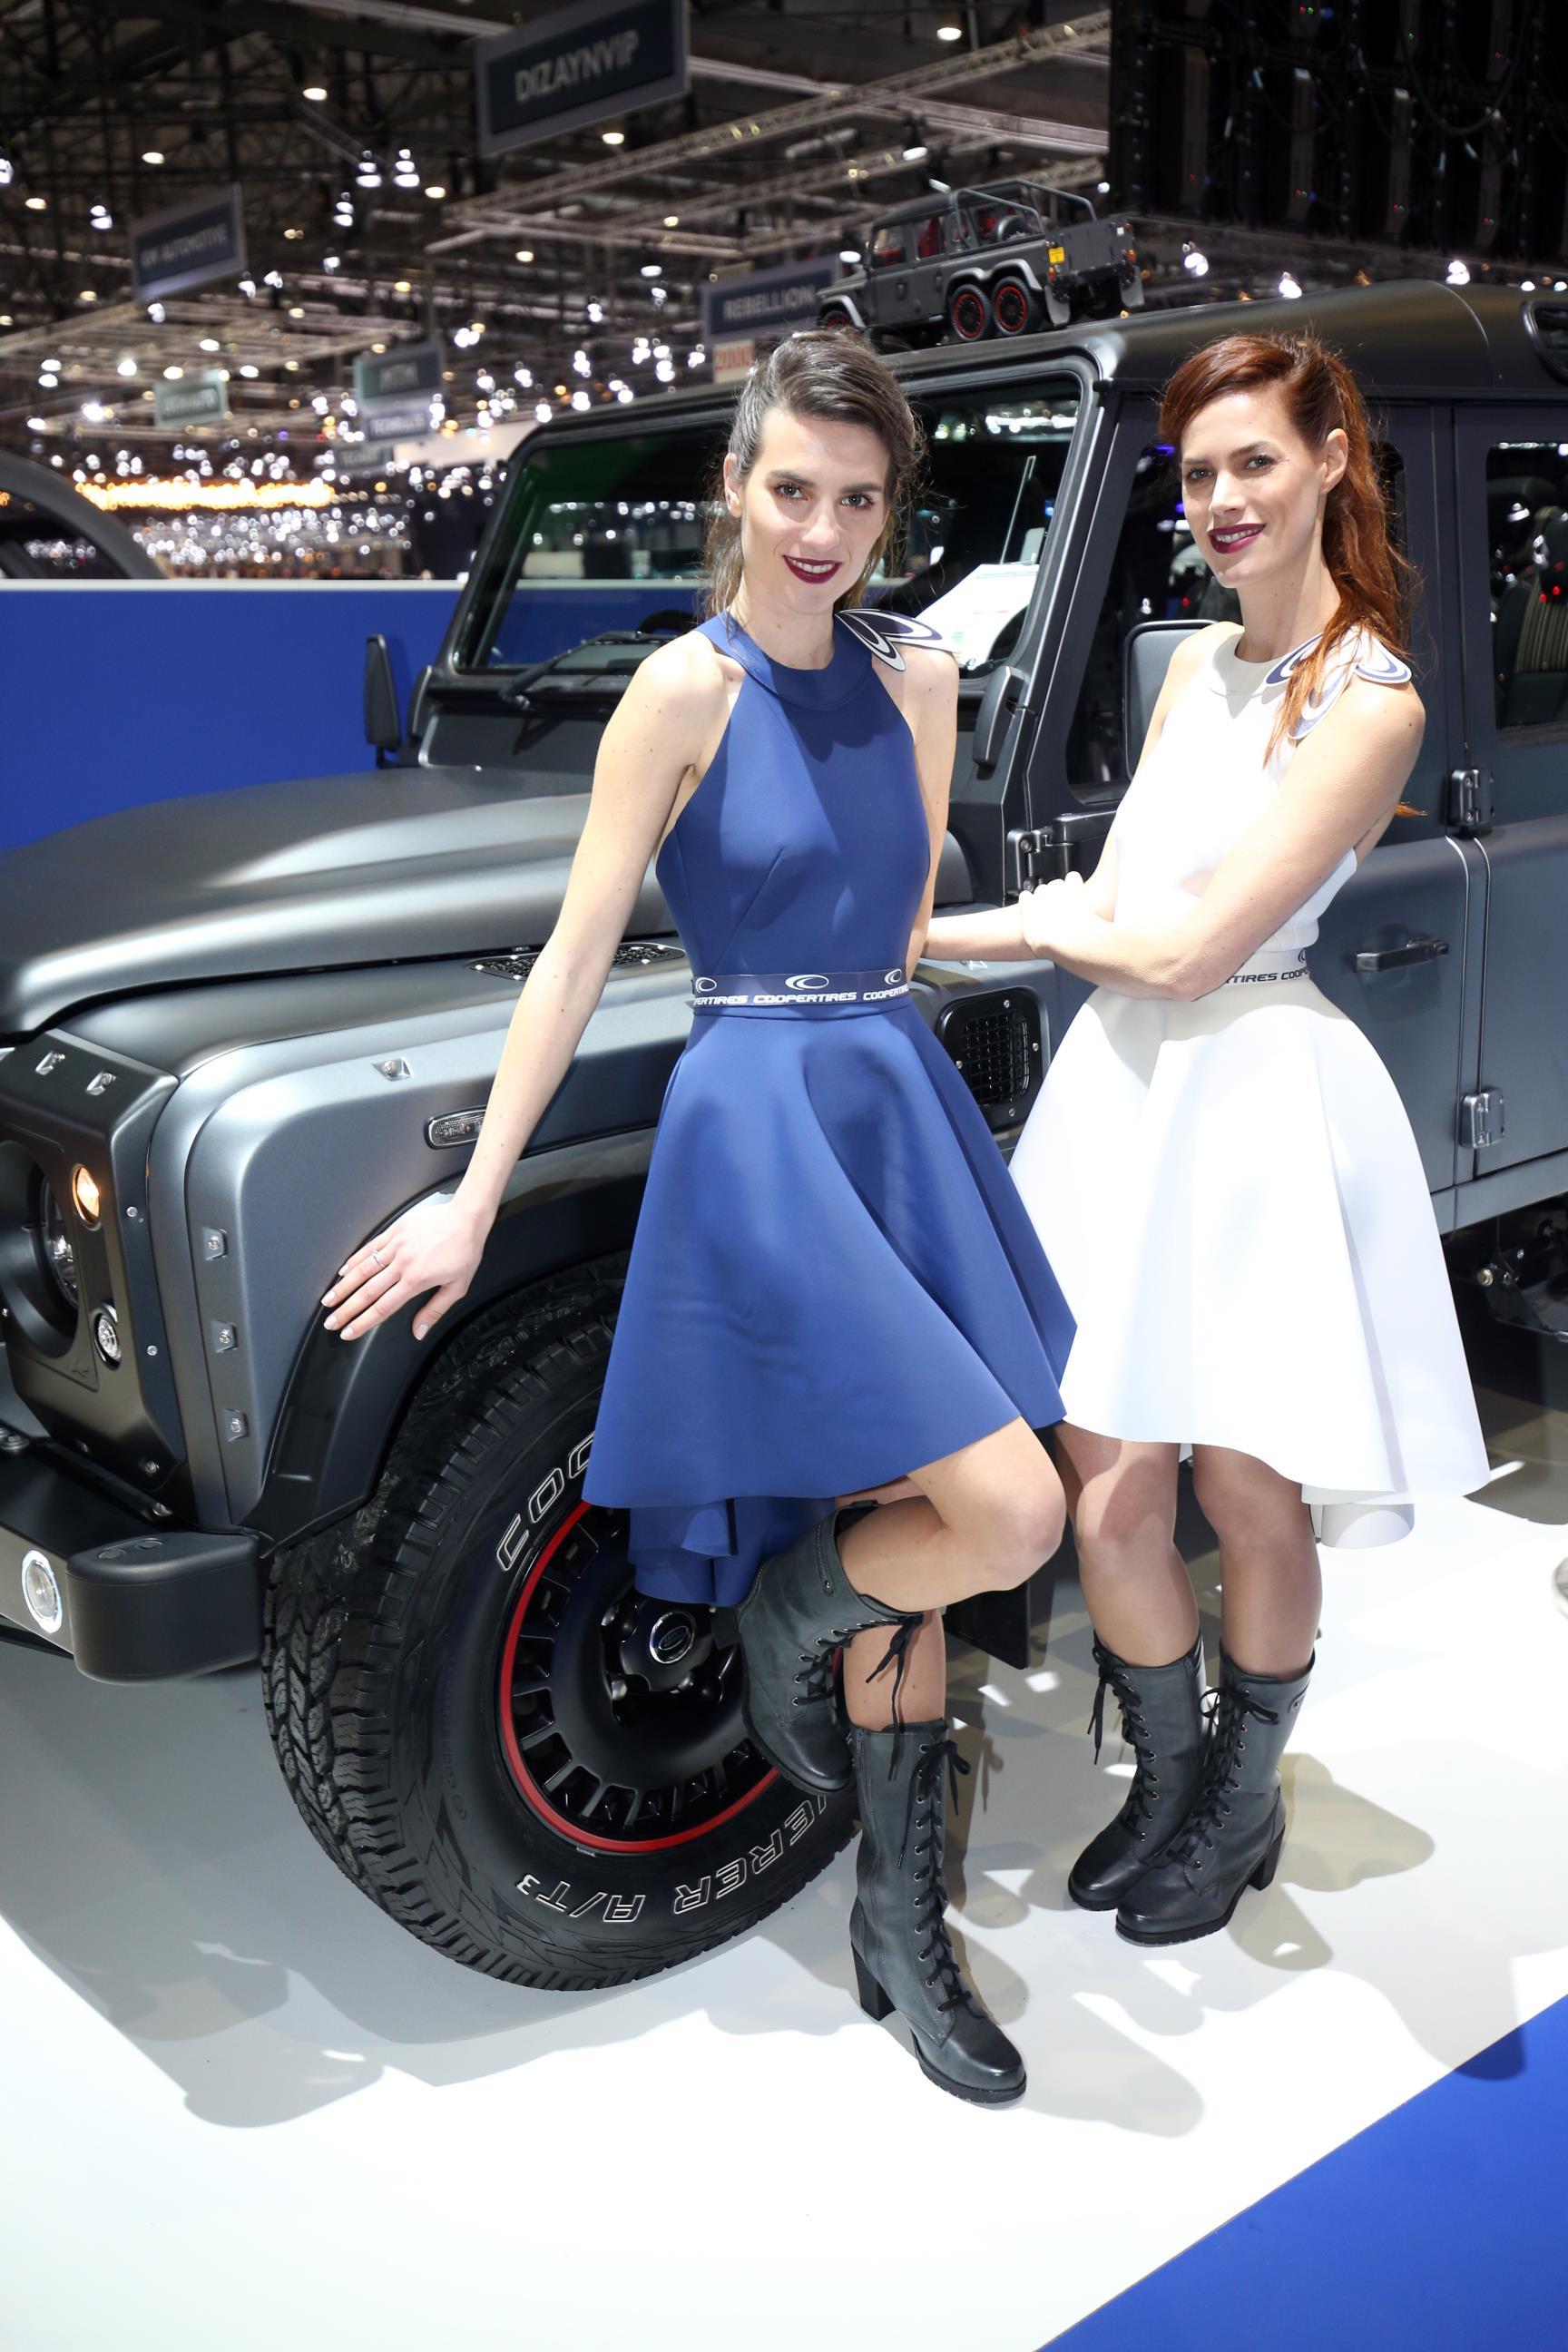 Geneva Motor Show 2018 Mega Gallery Part 2 (477)